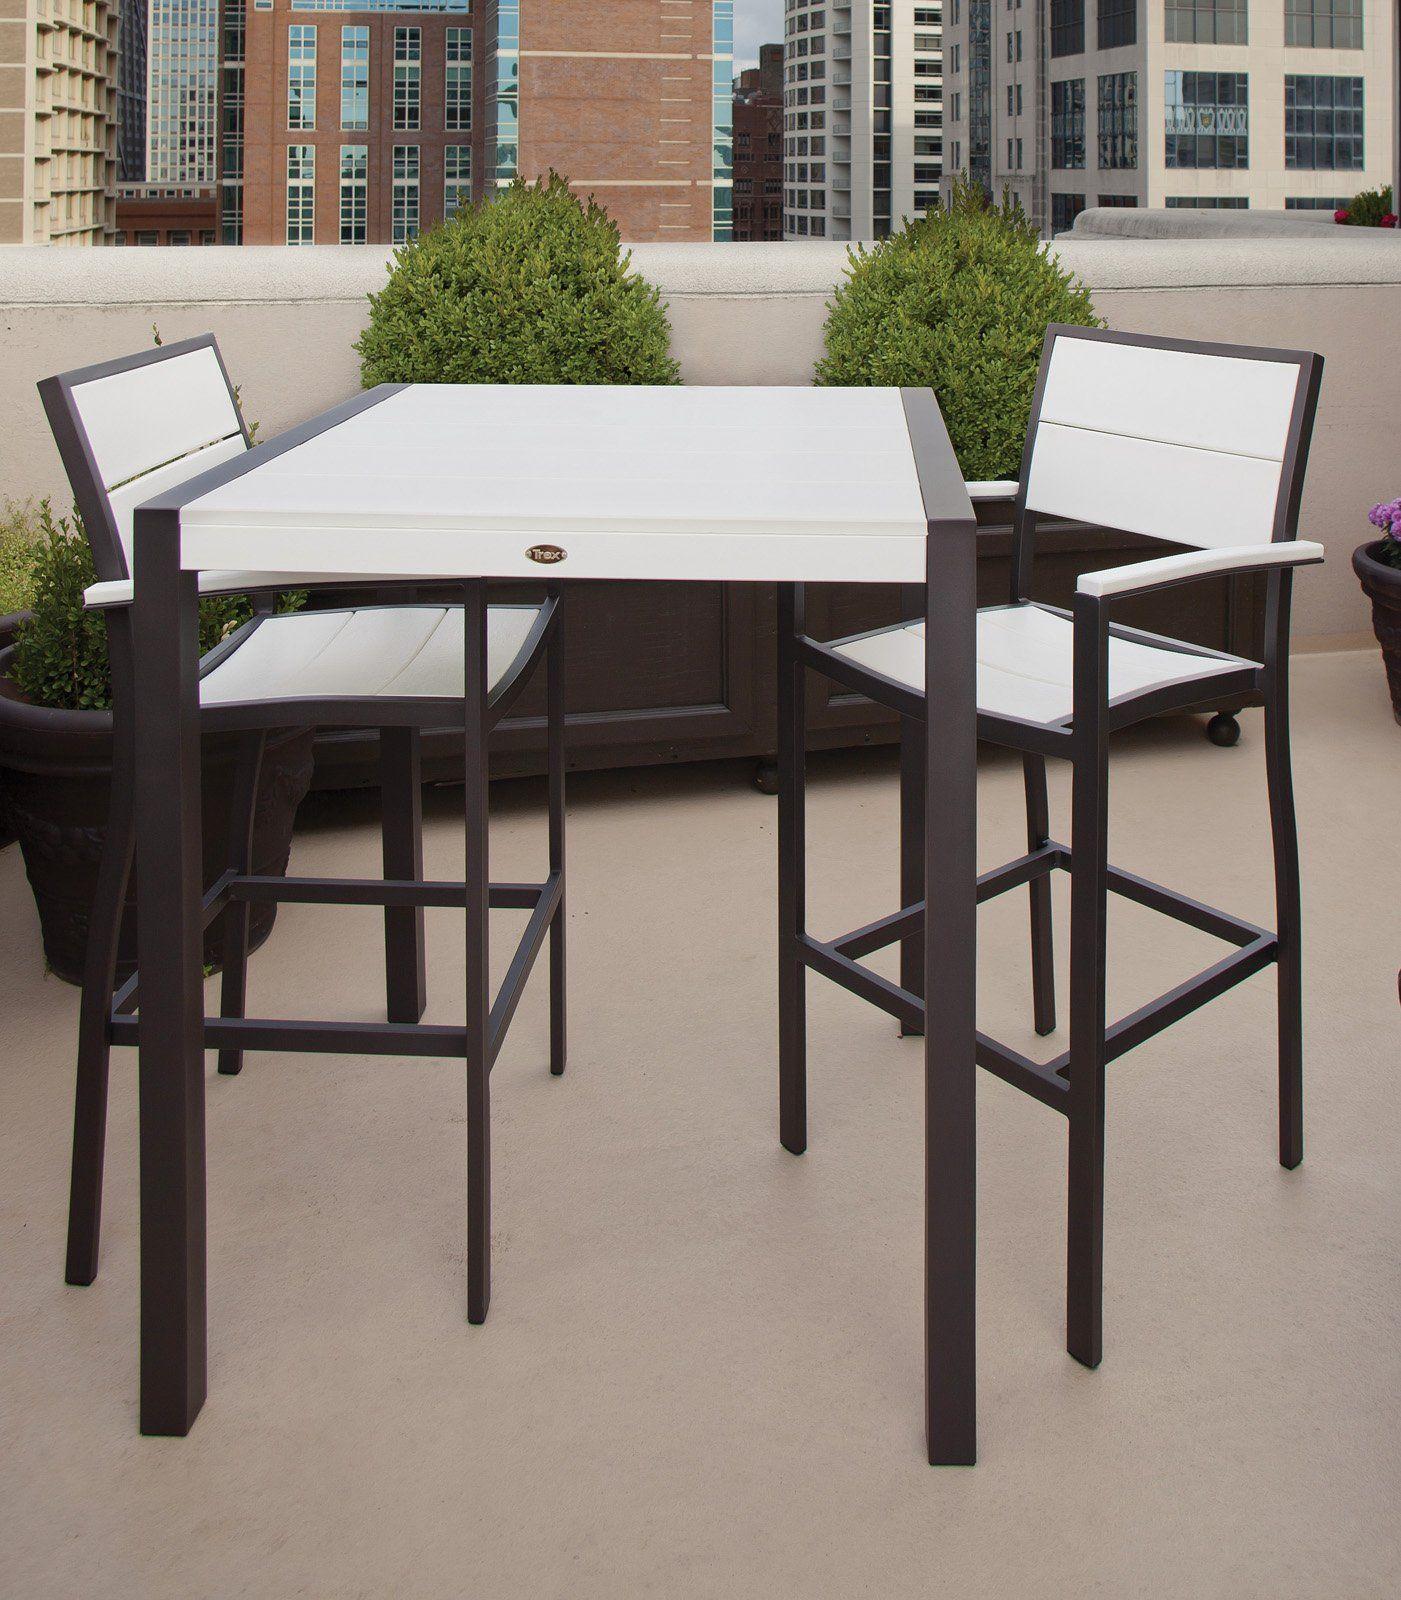 20+ Trex outdoor dining set Best Seller